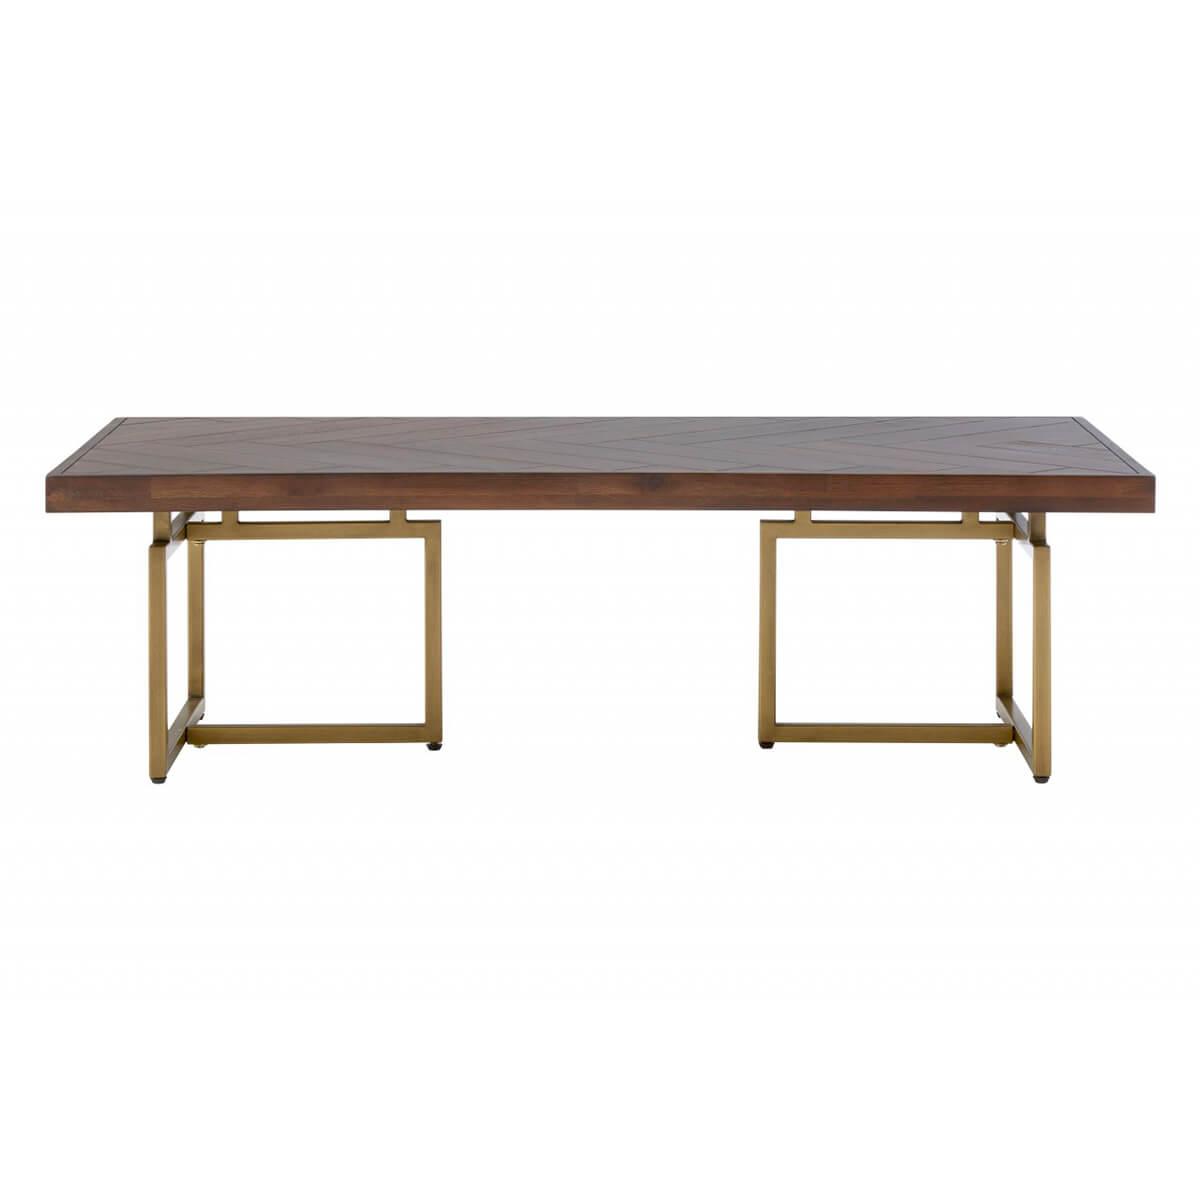 Brandy Acacia Wood & Brass Coffee Table